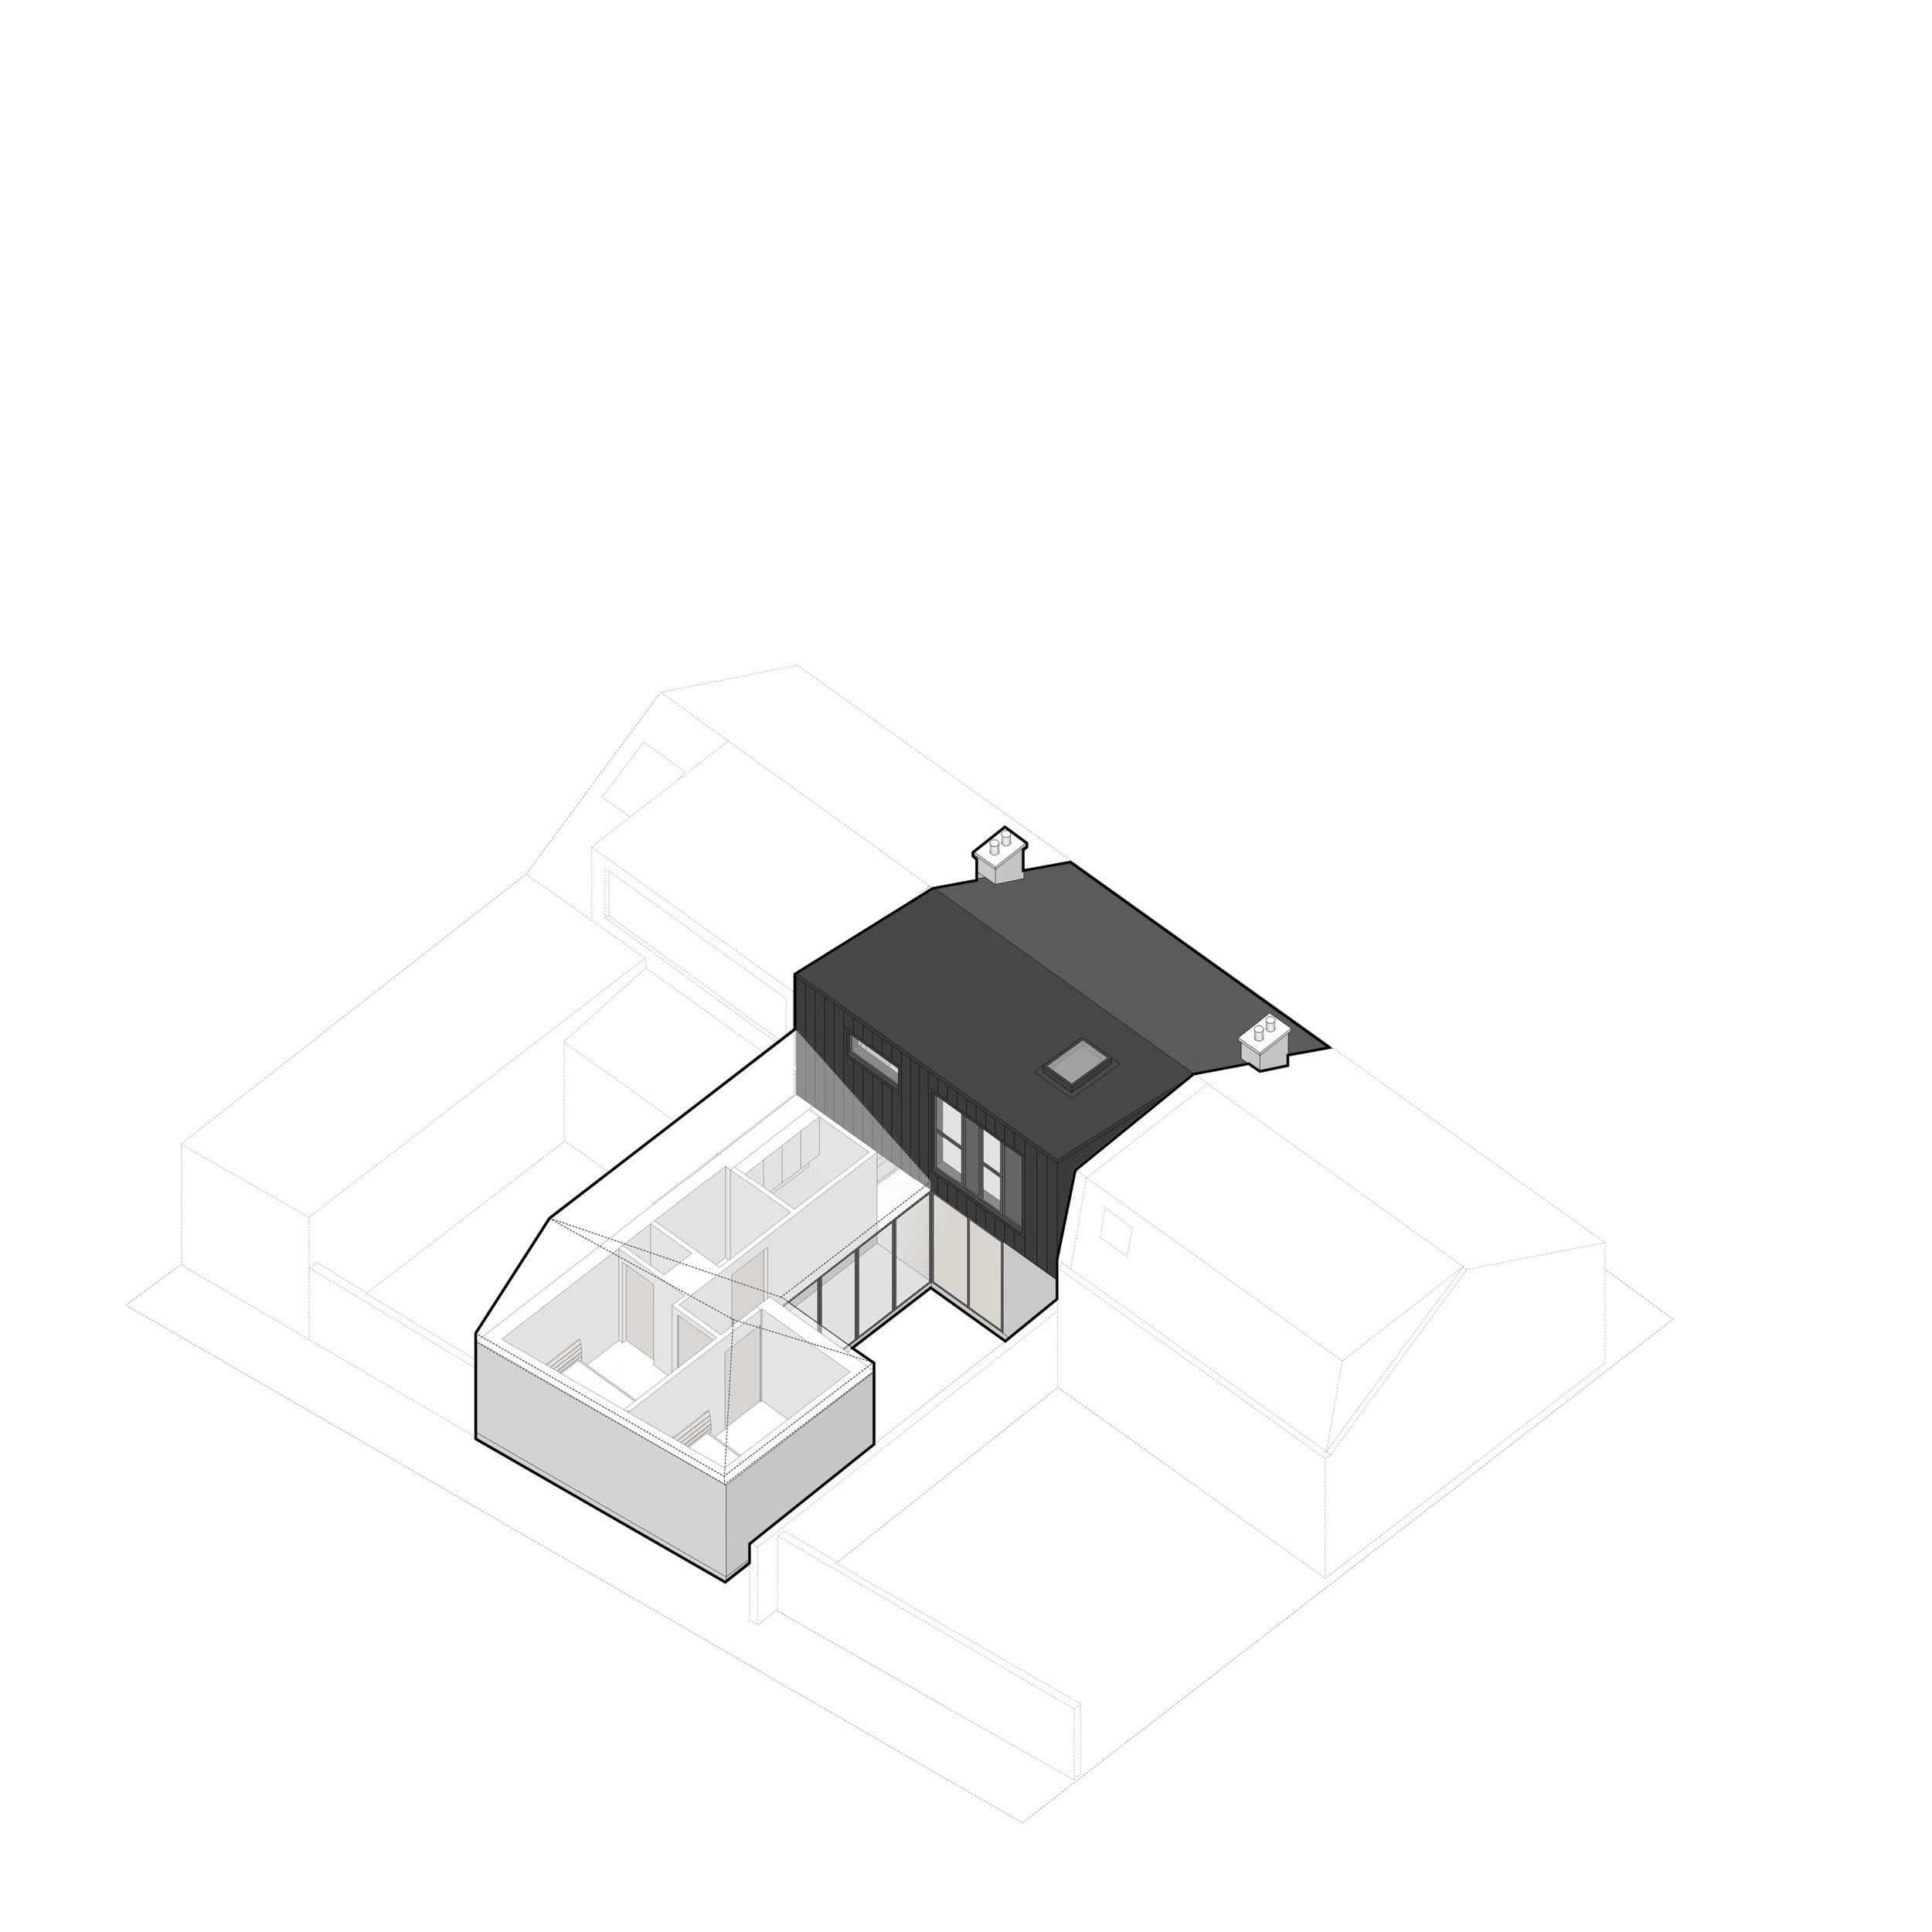 Model_Proposed_Axonometric.jpg